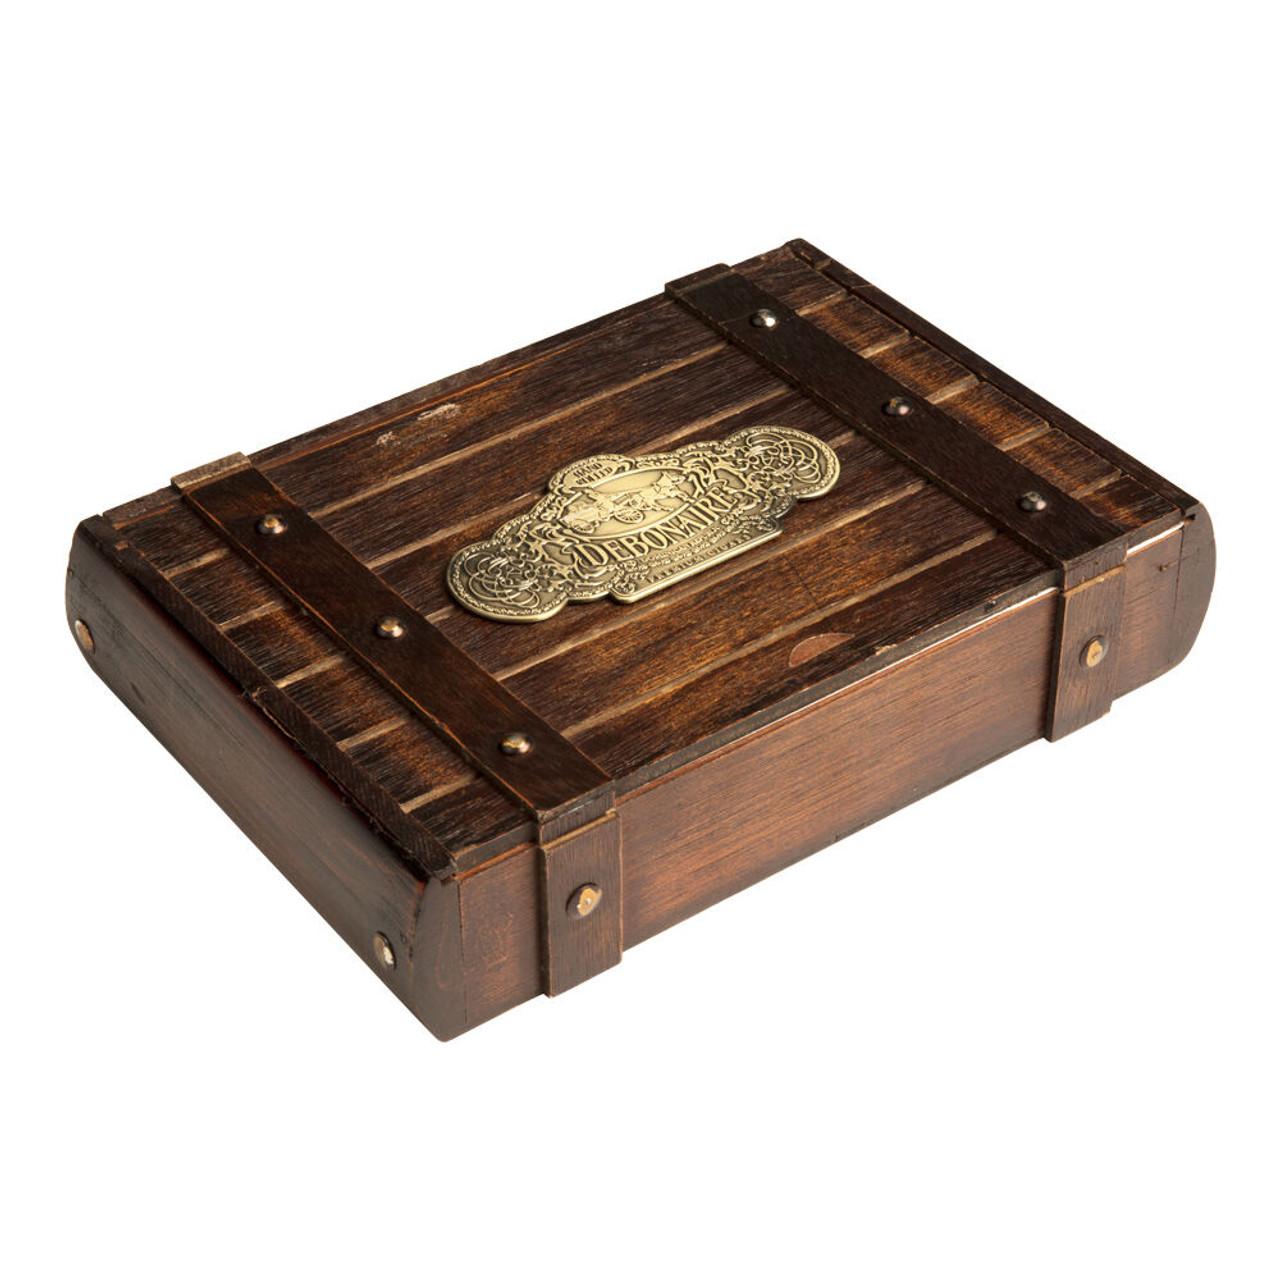 Debonaire Habano Belicoso Cigars - 6 x 54 (Box of 20)